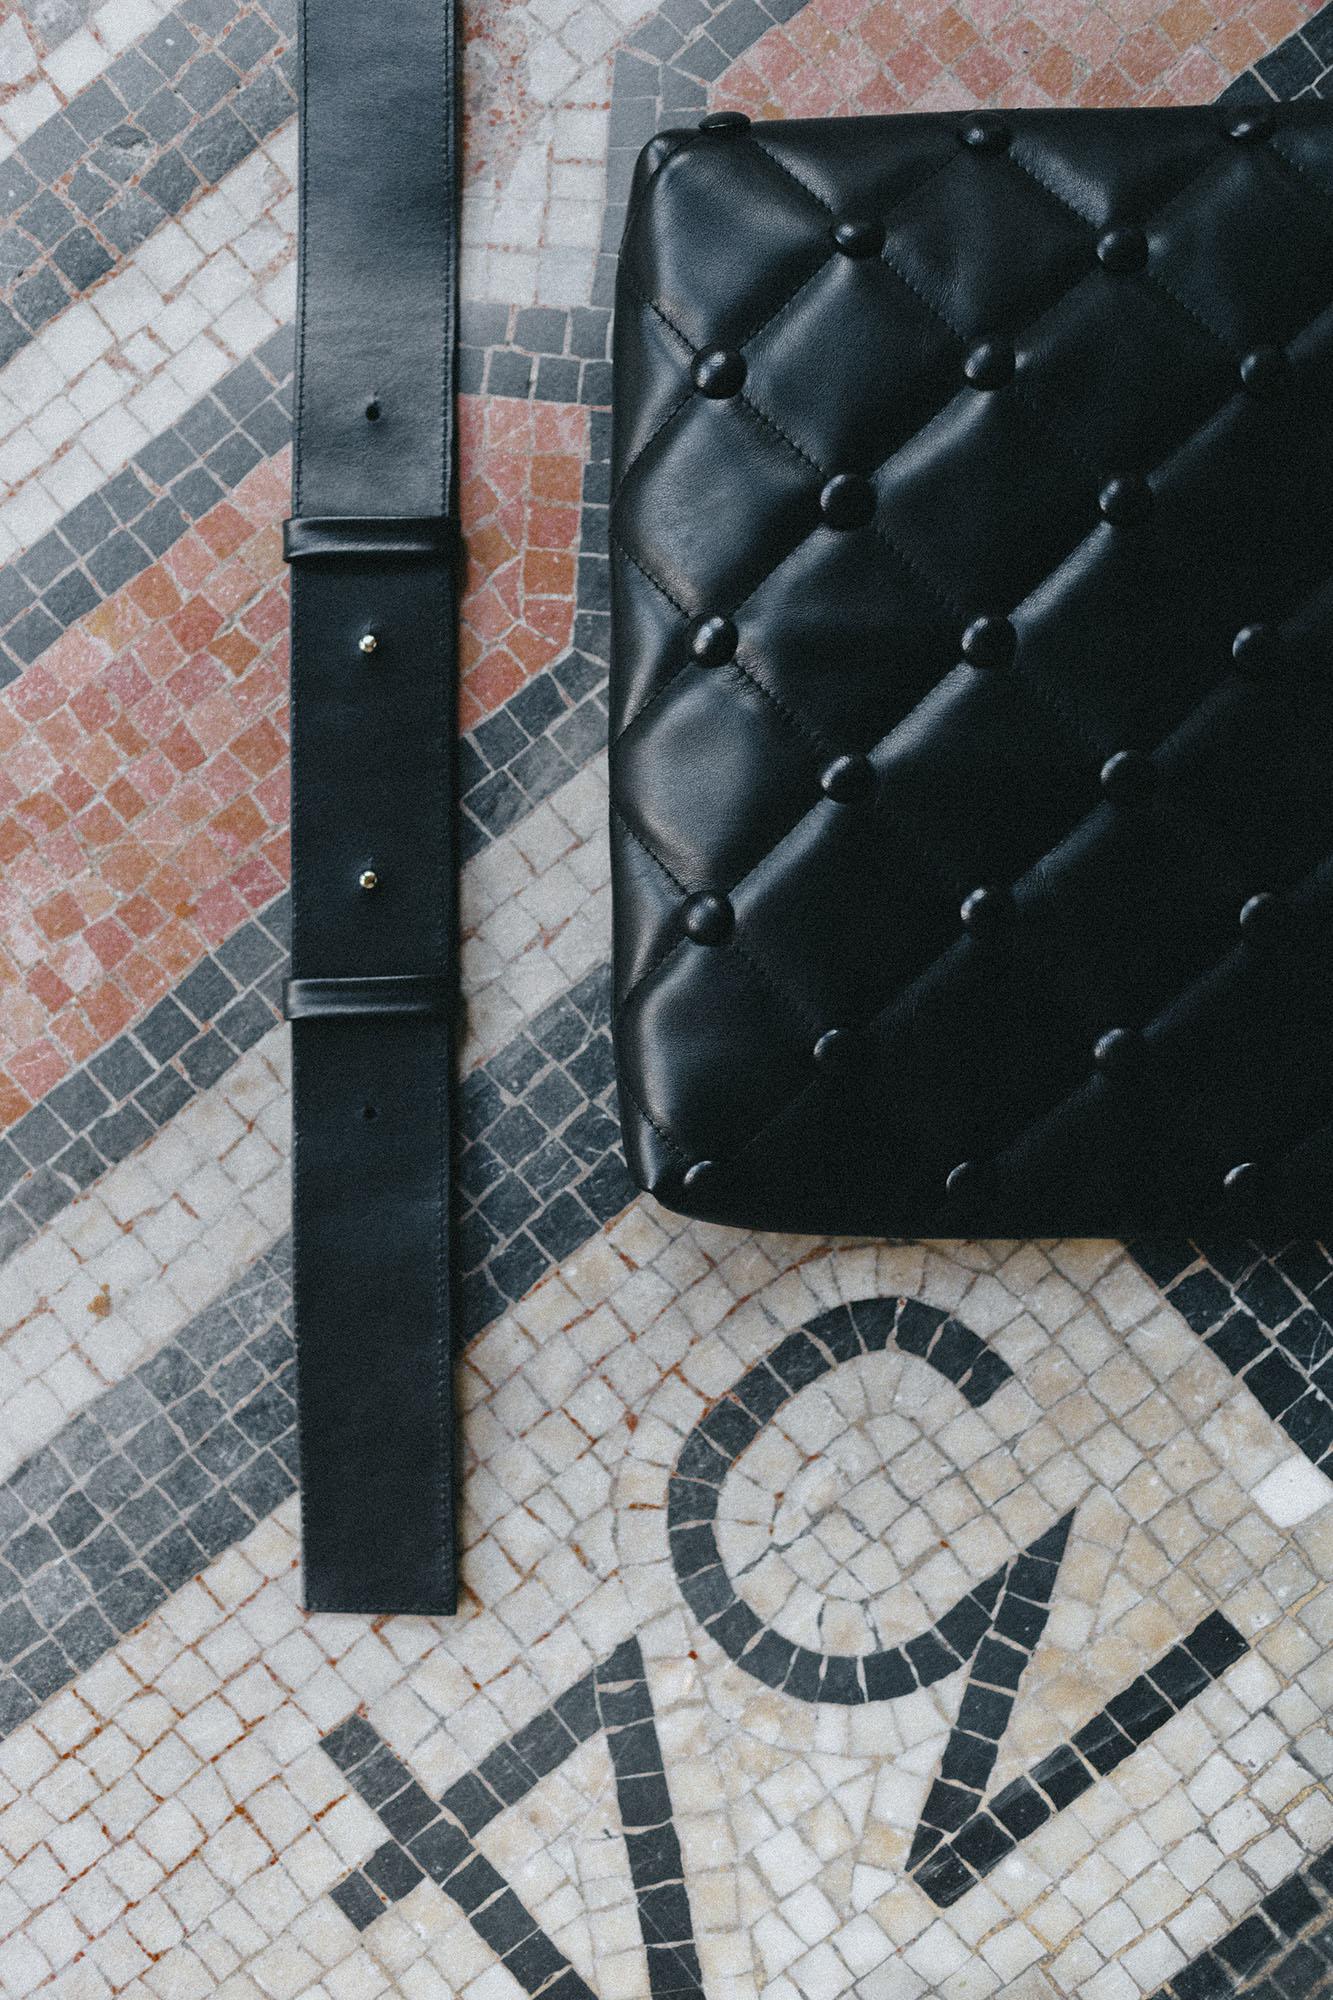 Laimushka black leather handbag with shoulder strap on the floor in Paris, Palais Royal